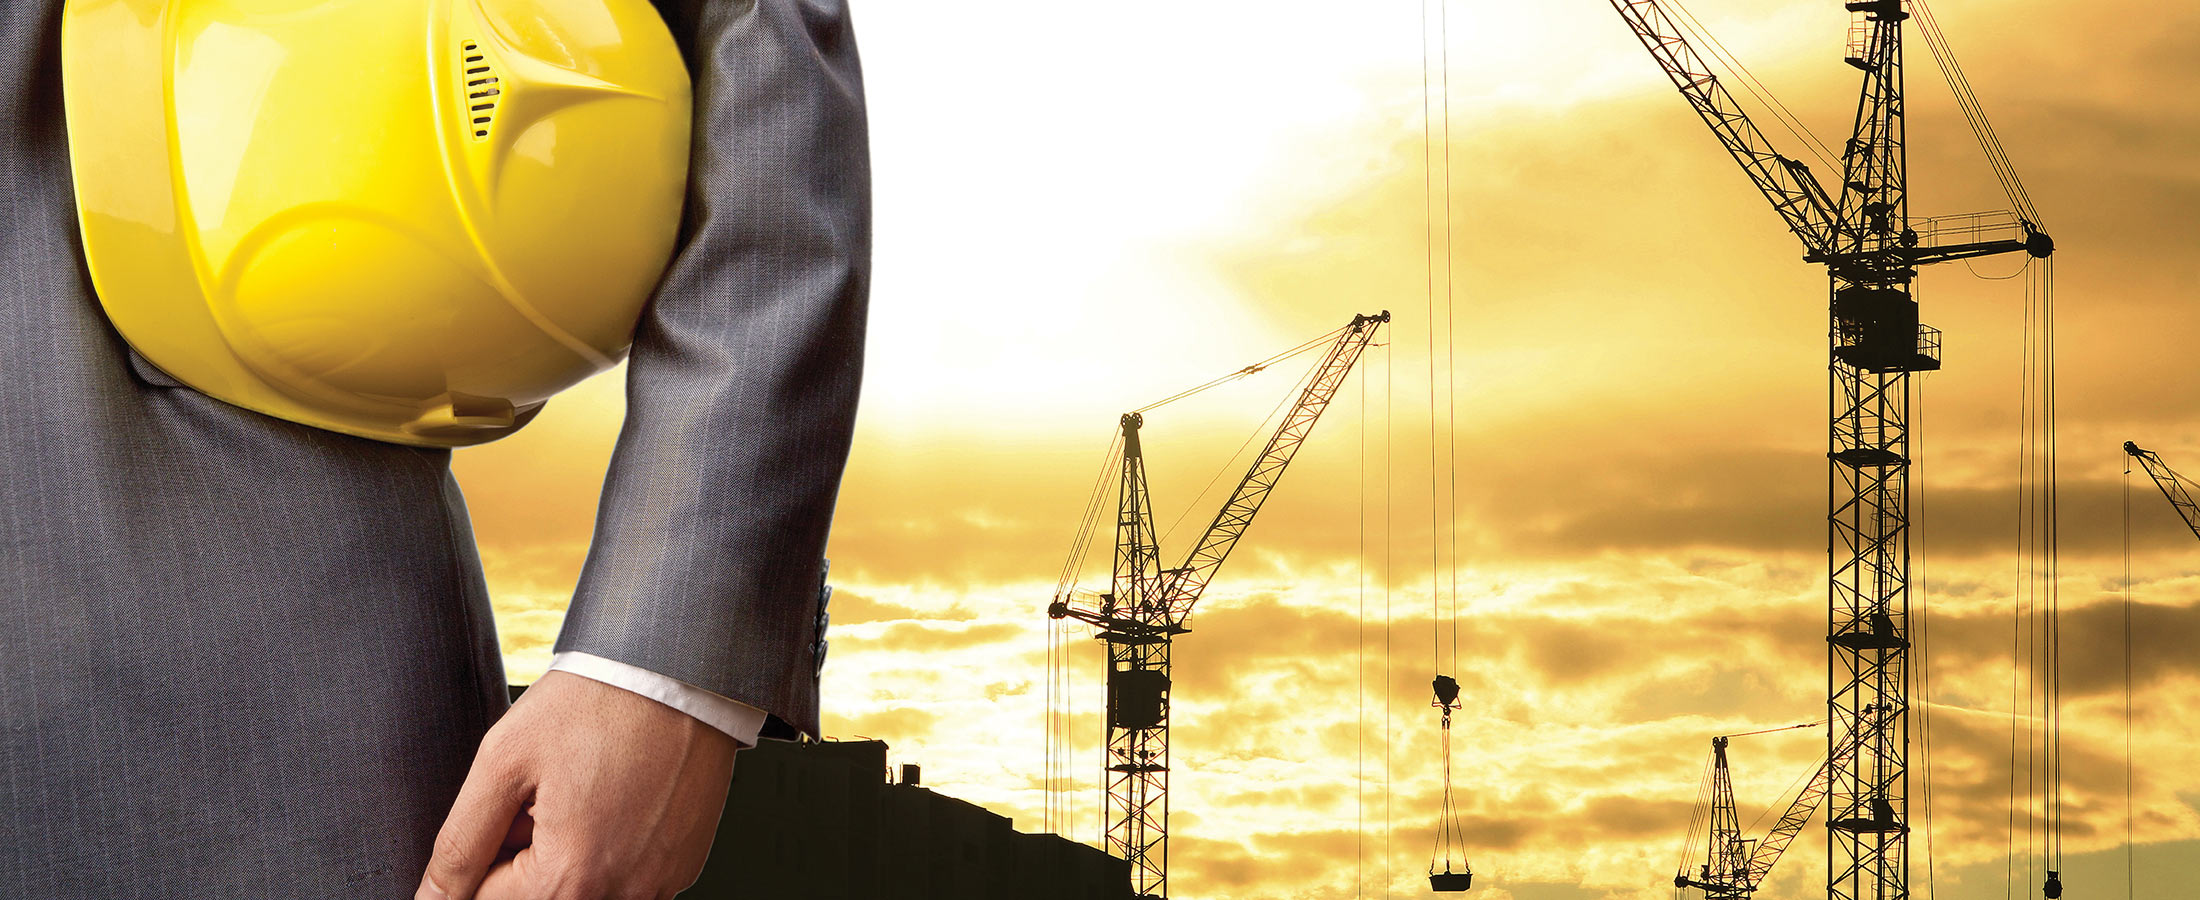 construction bg1